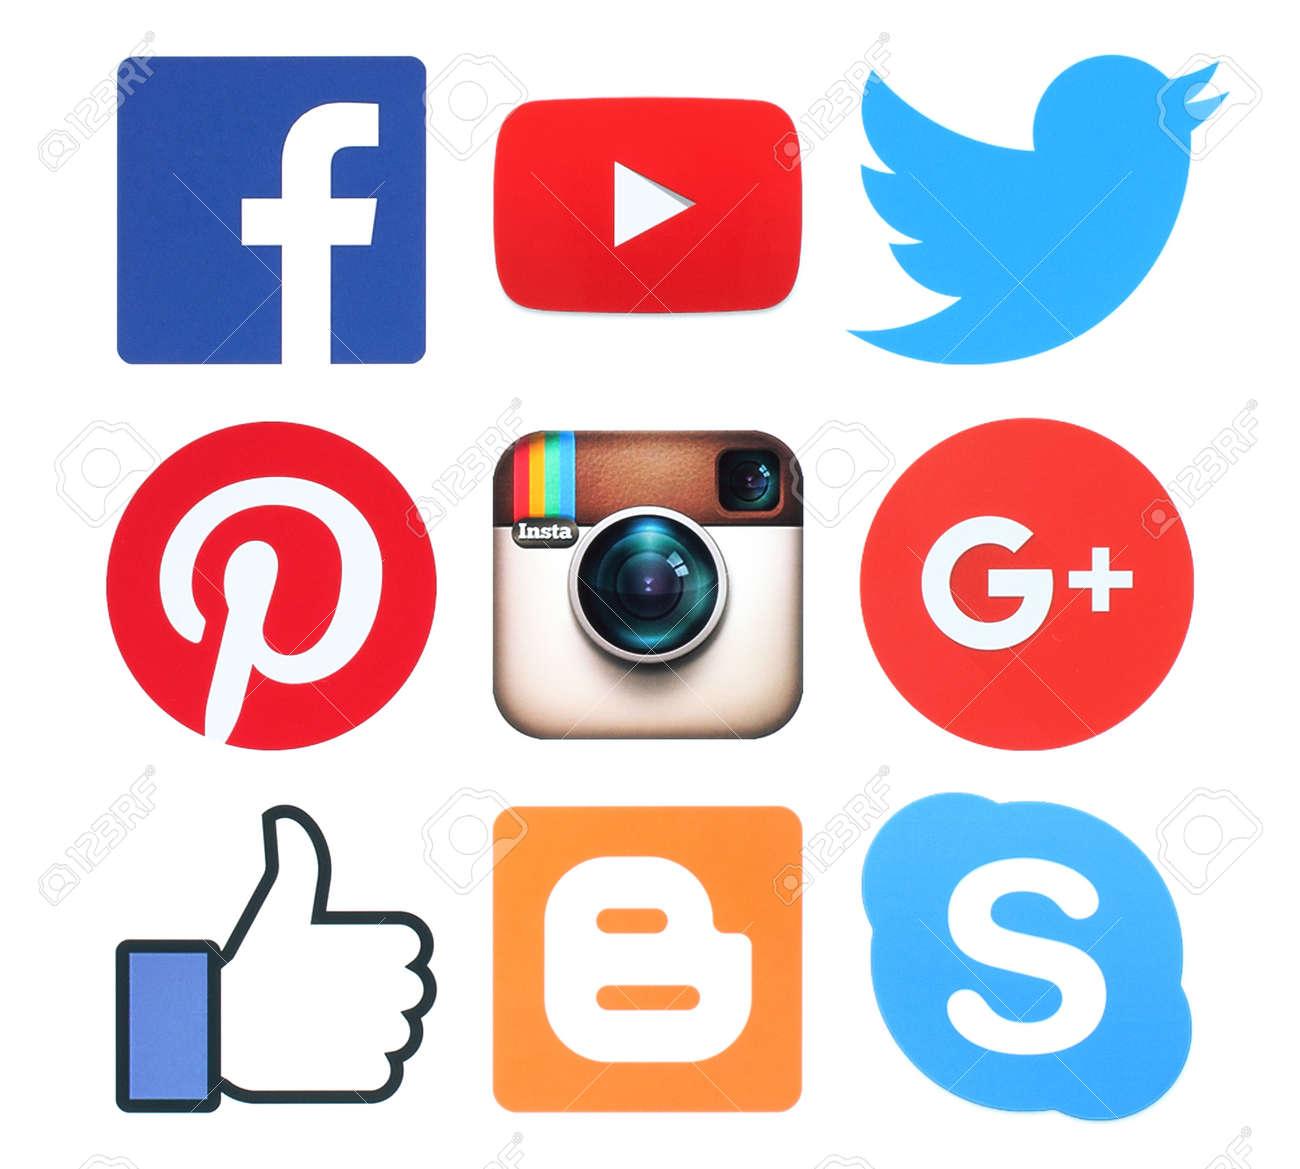 Kiev, Ukraine - February 8, 2016:Collection of popular social media logo signs printed on paper:Facebook, Twitter, Google Plus, Instagram, Pinterest, Skype, YouTube and Blogger - 52114532